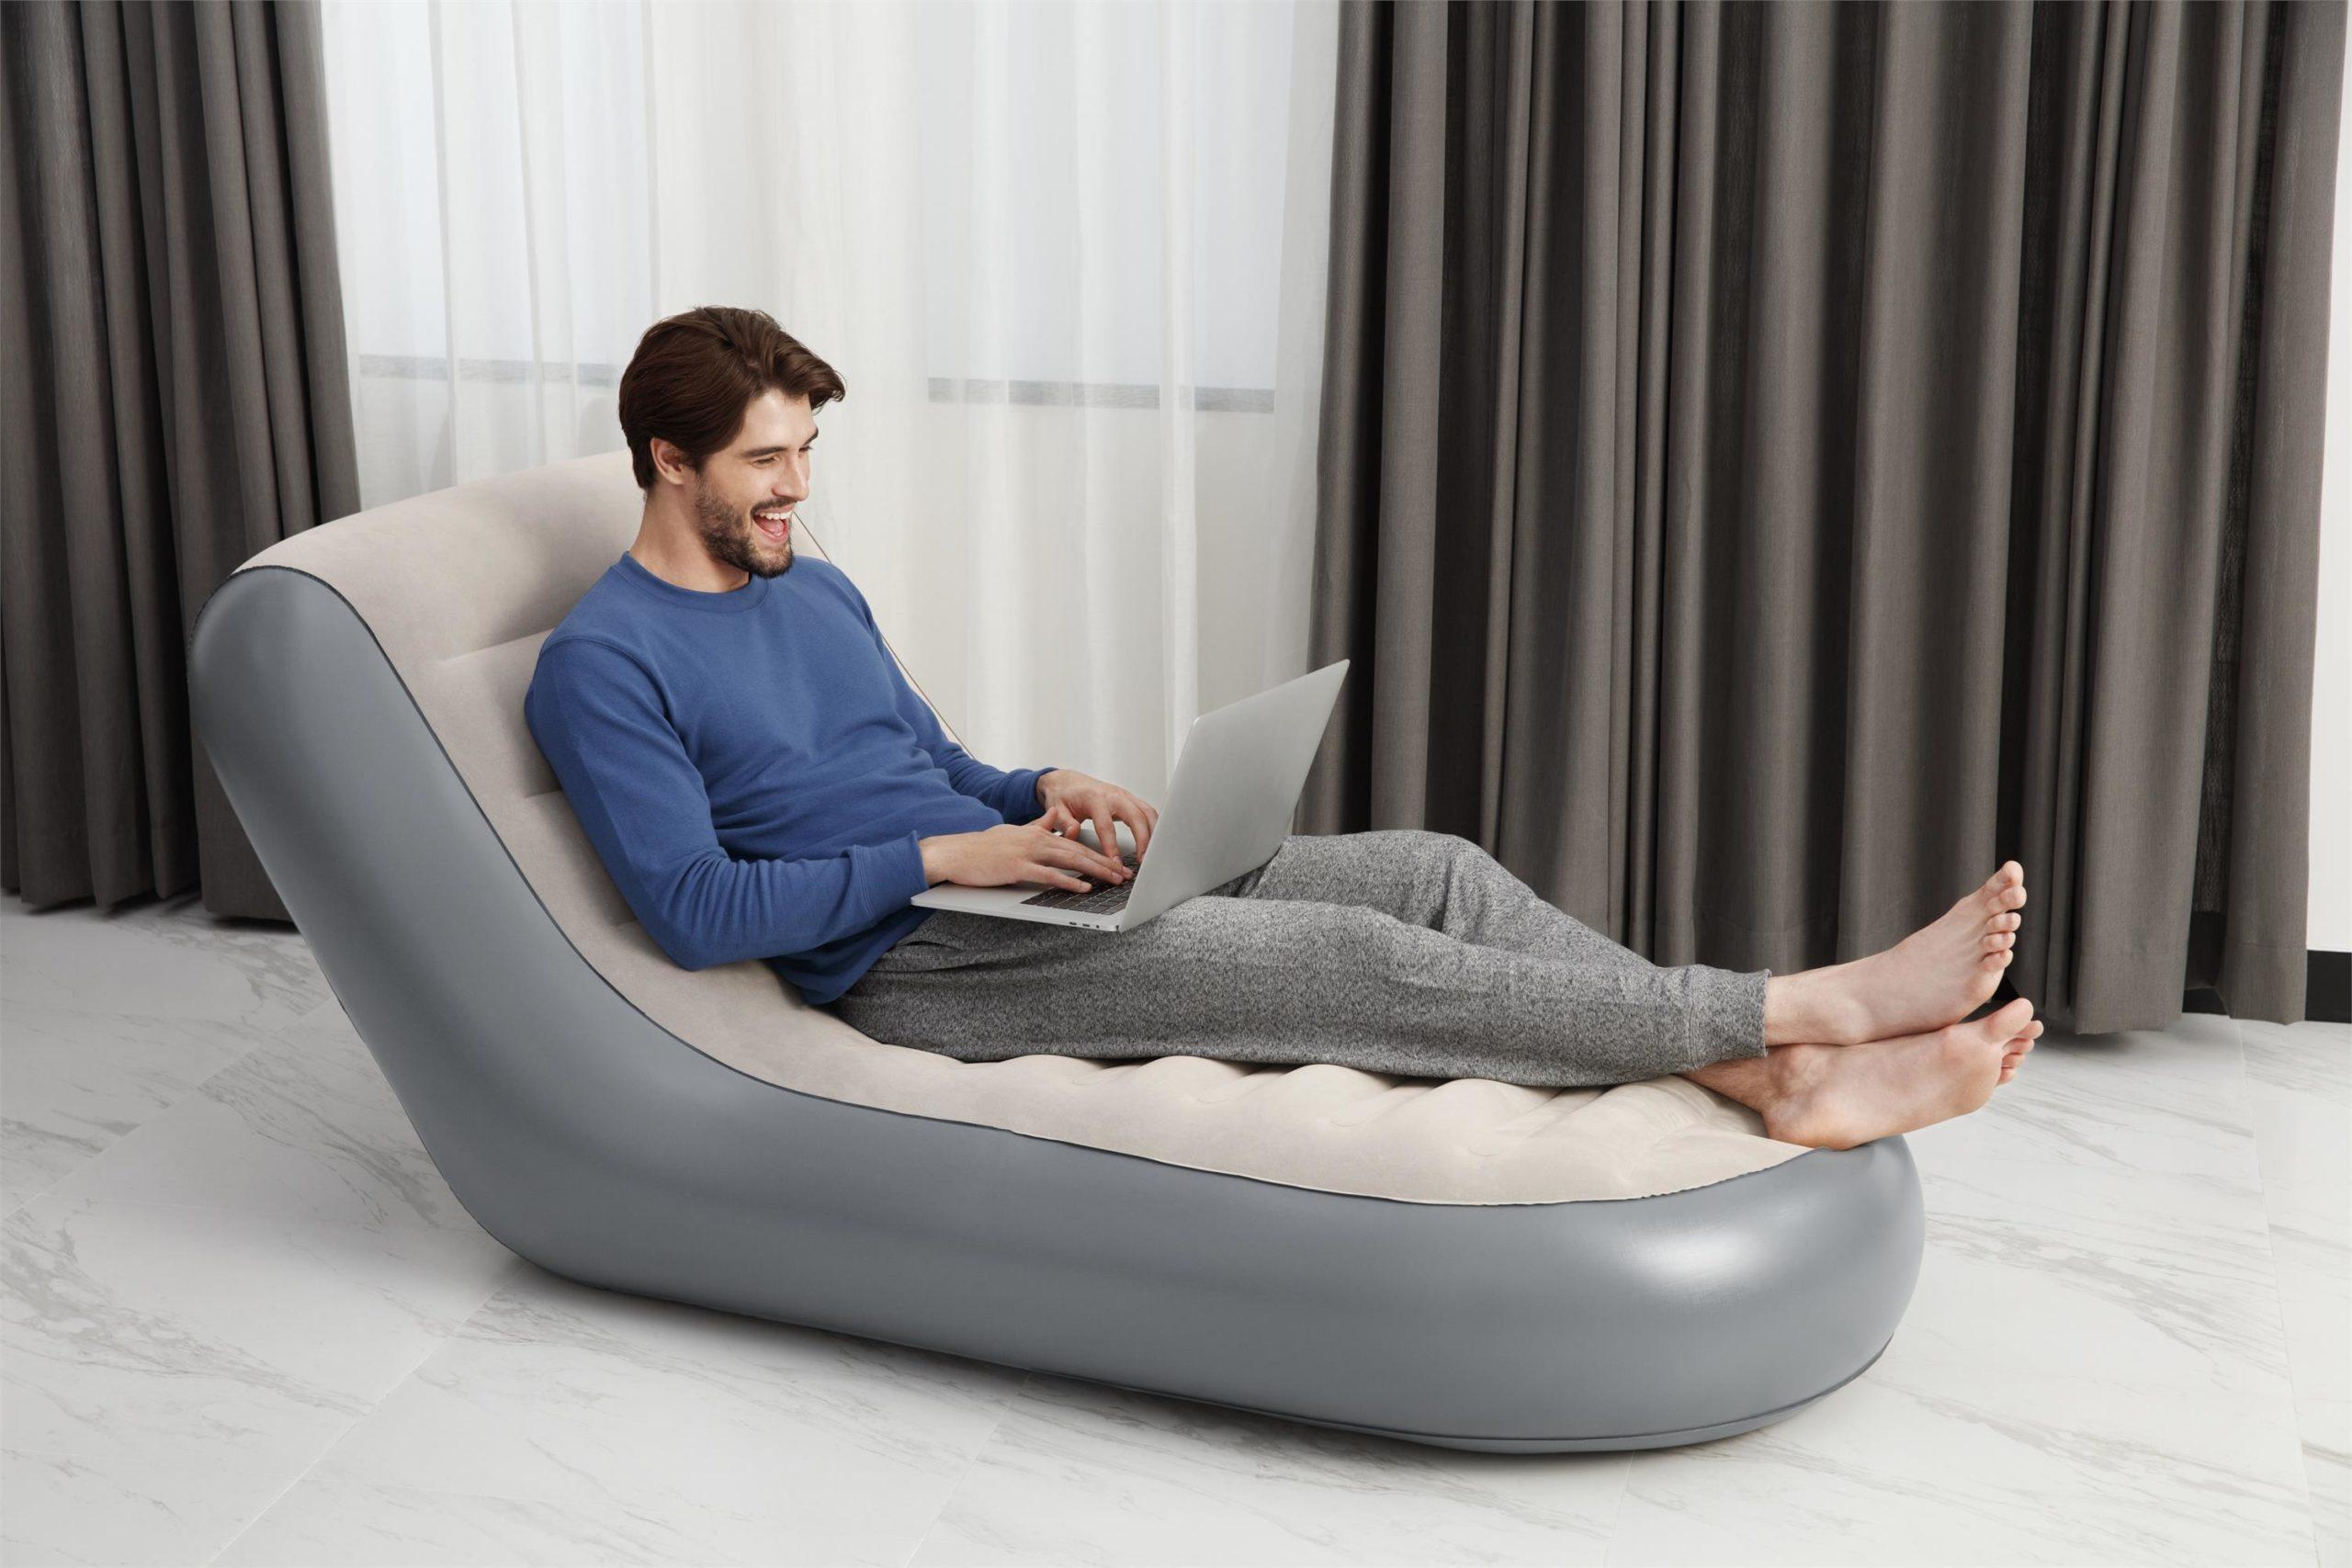 bestway&ndash-chaise-sport-lounger-165m-x-84cm-x-79cm-75064